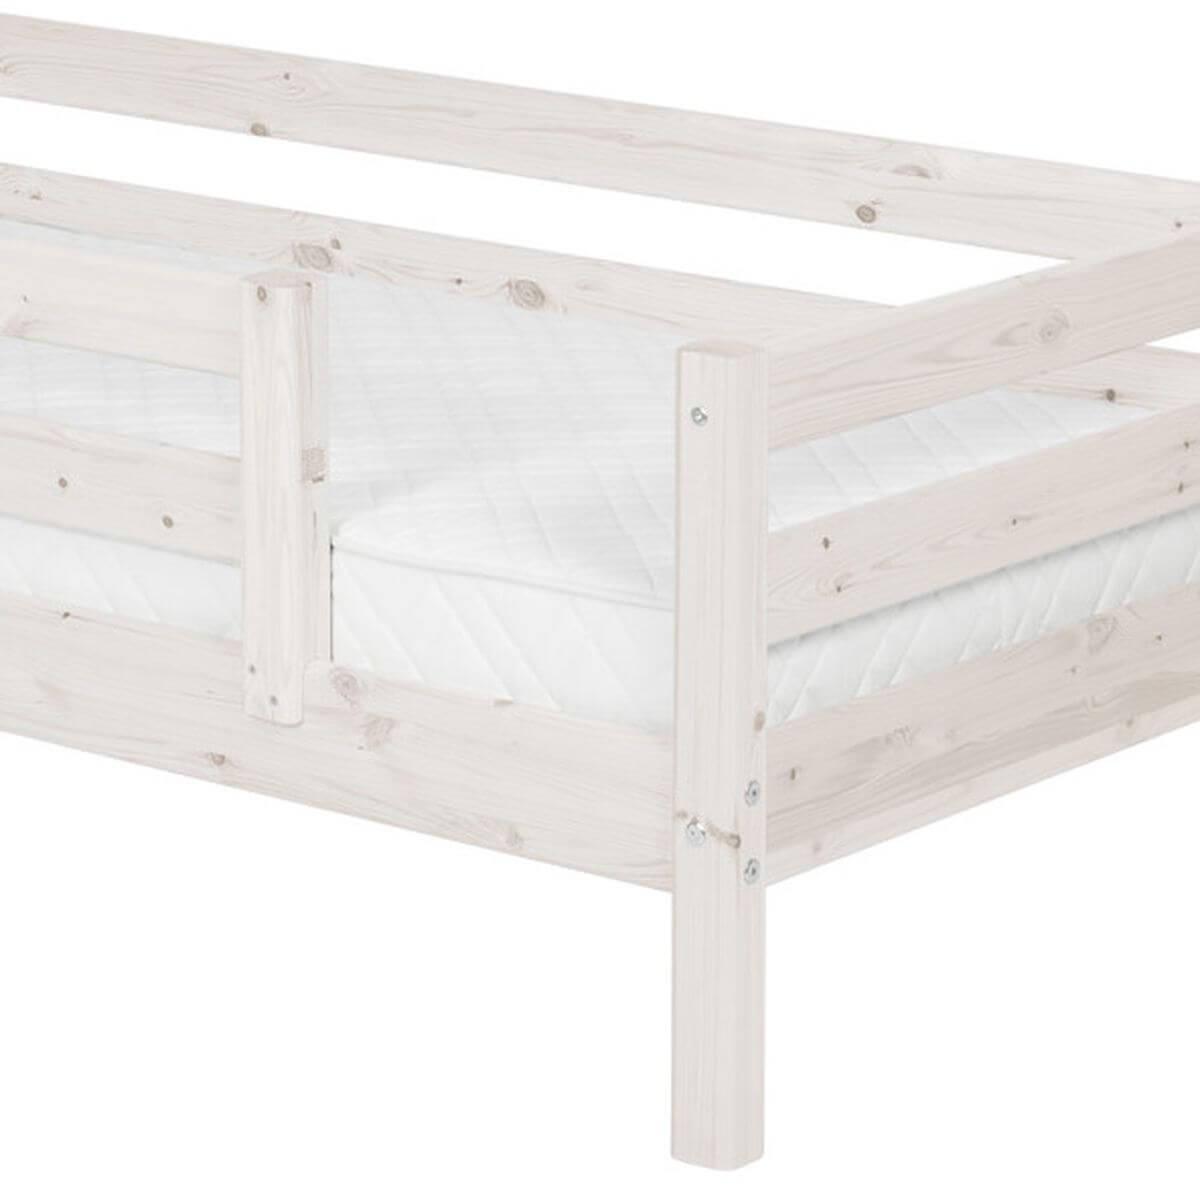 Cama individual barrera 1/2 90x200 CLASSIC Flexa blanco cal